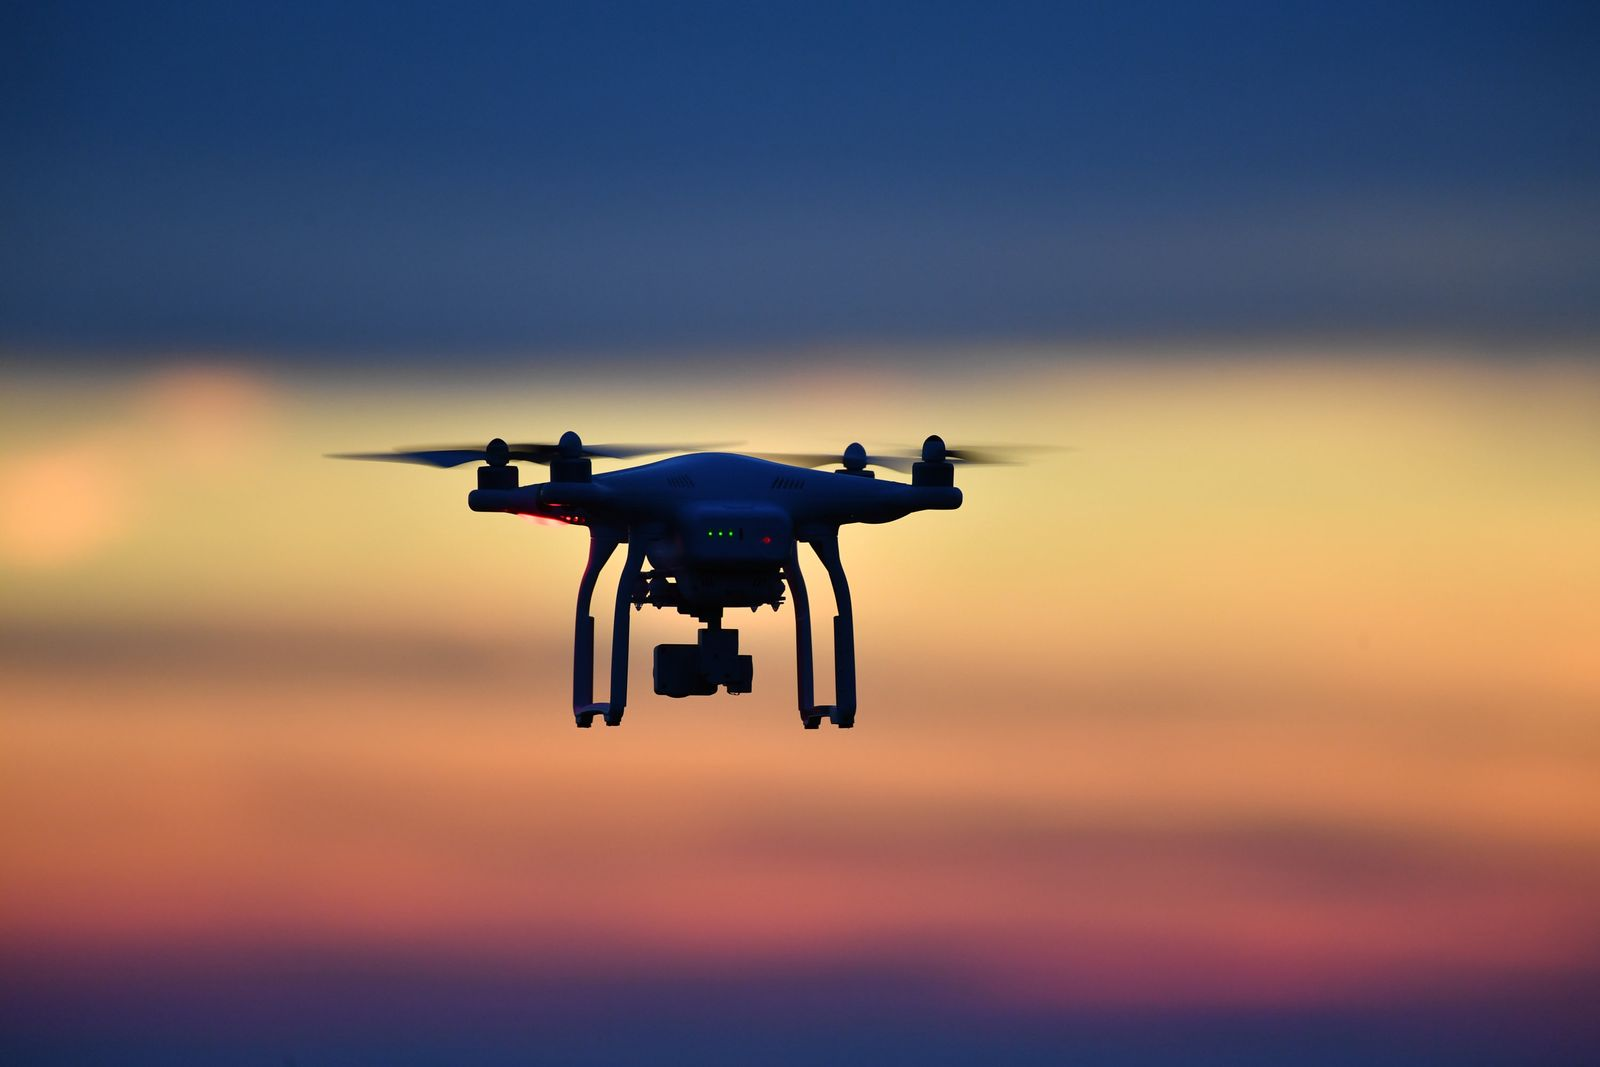 Drohne fliegt am Abend